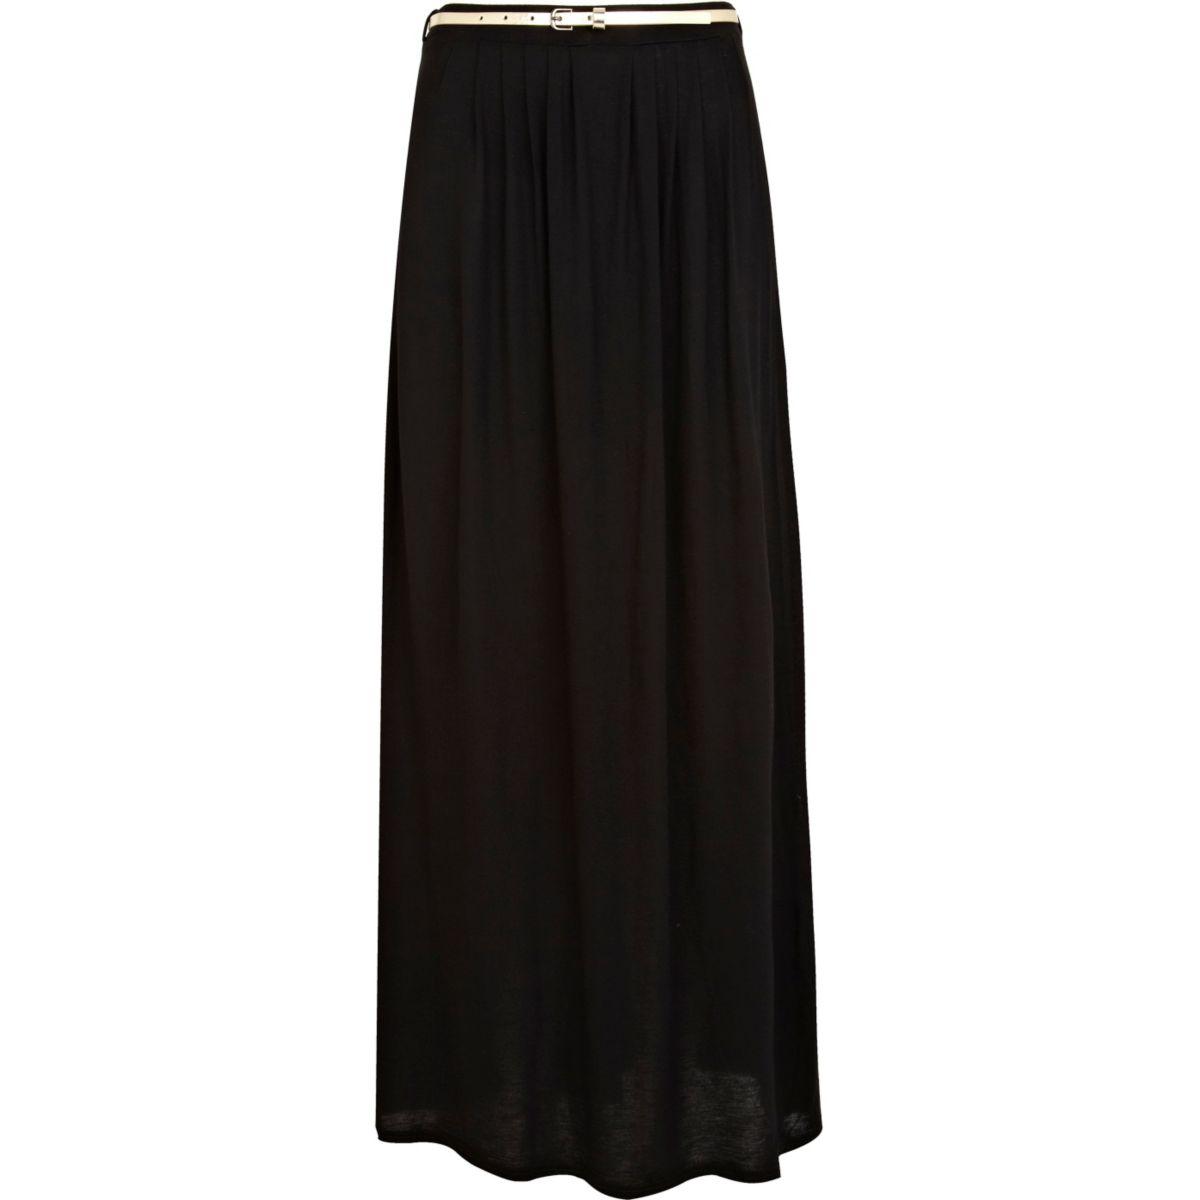 Black jersey belted maxi skirt